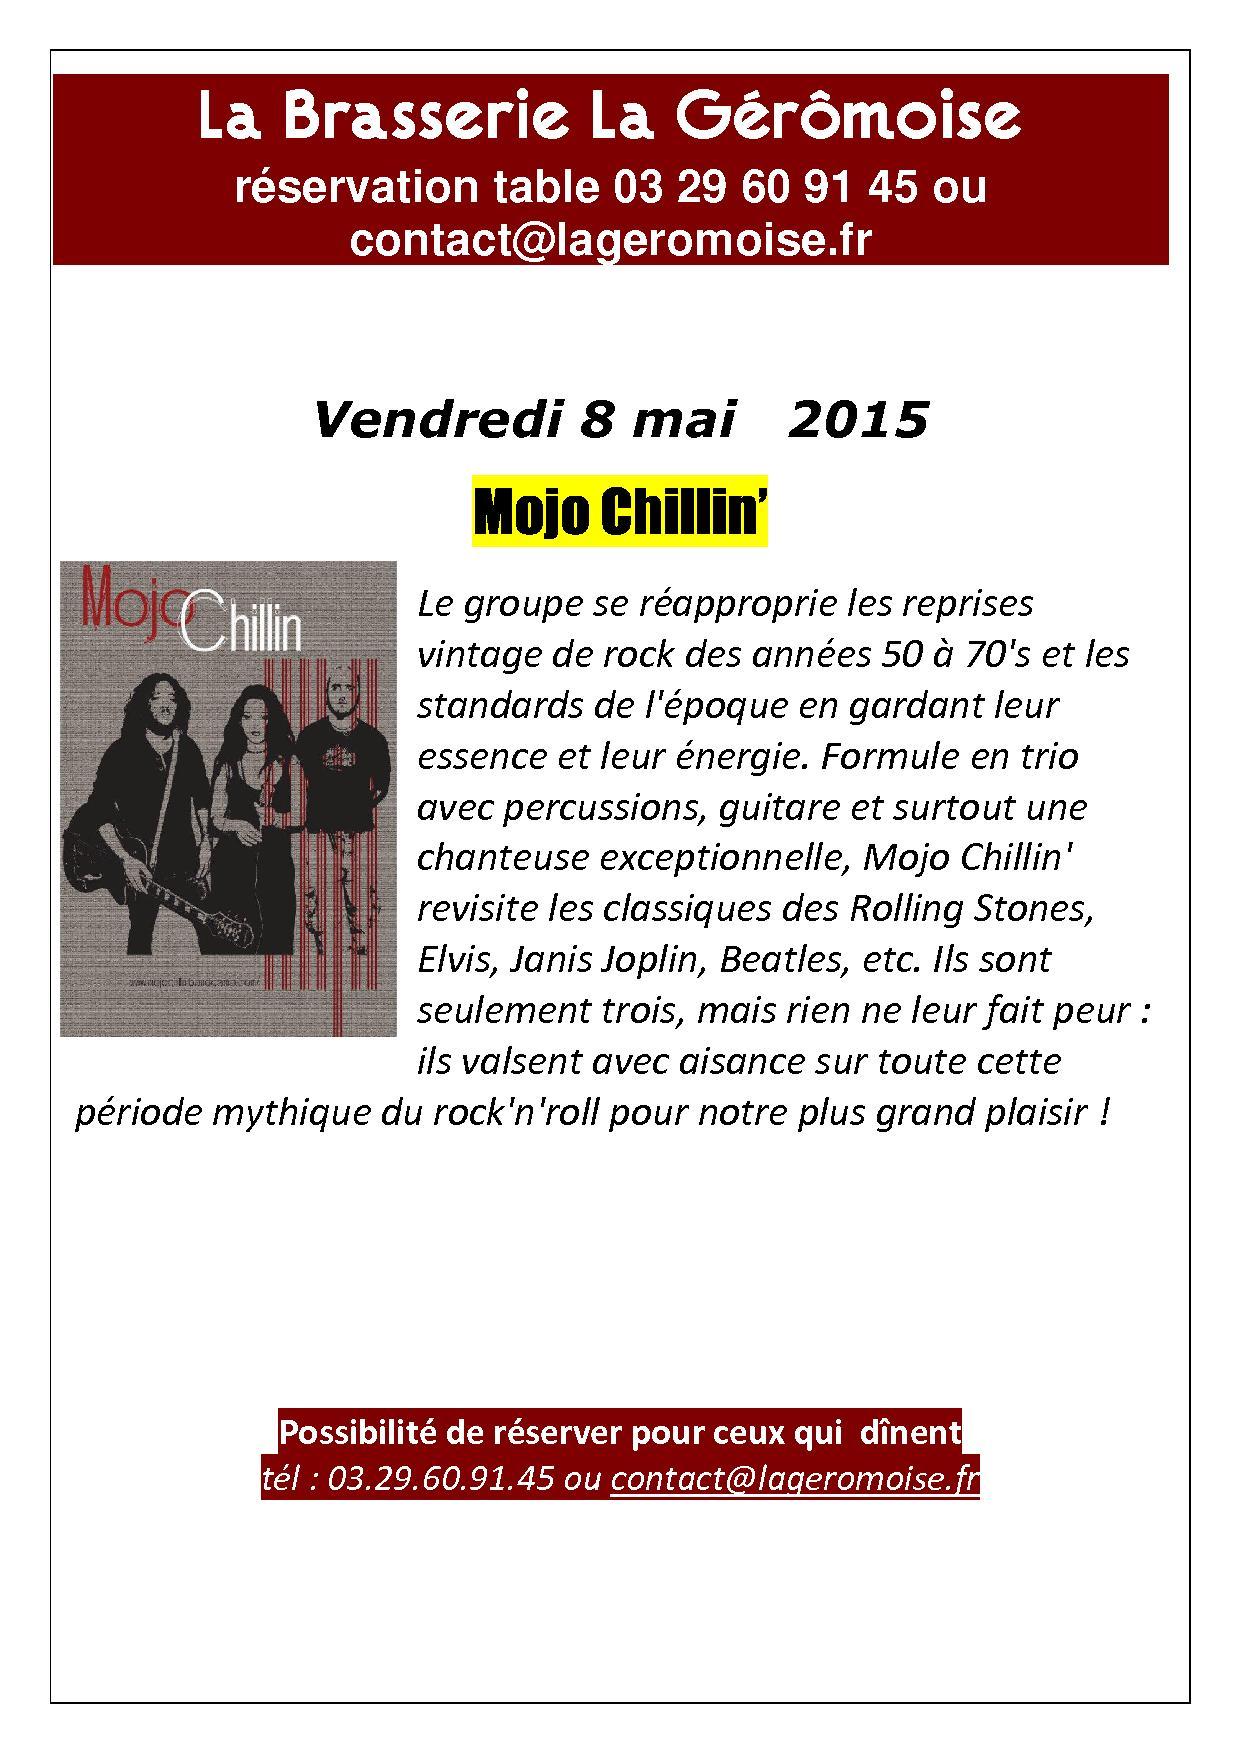 concerts-vacances-8-mai-2015.jpg